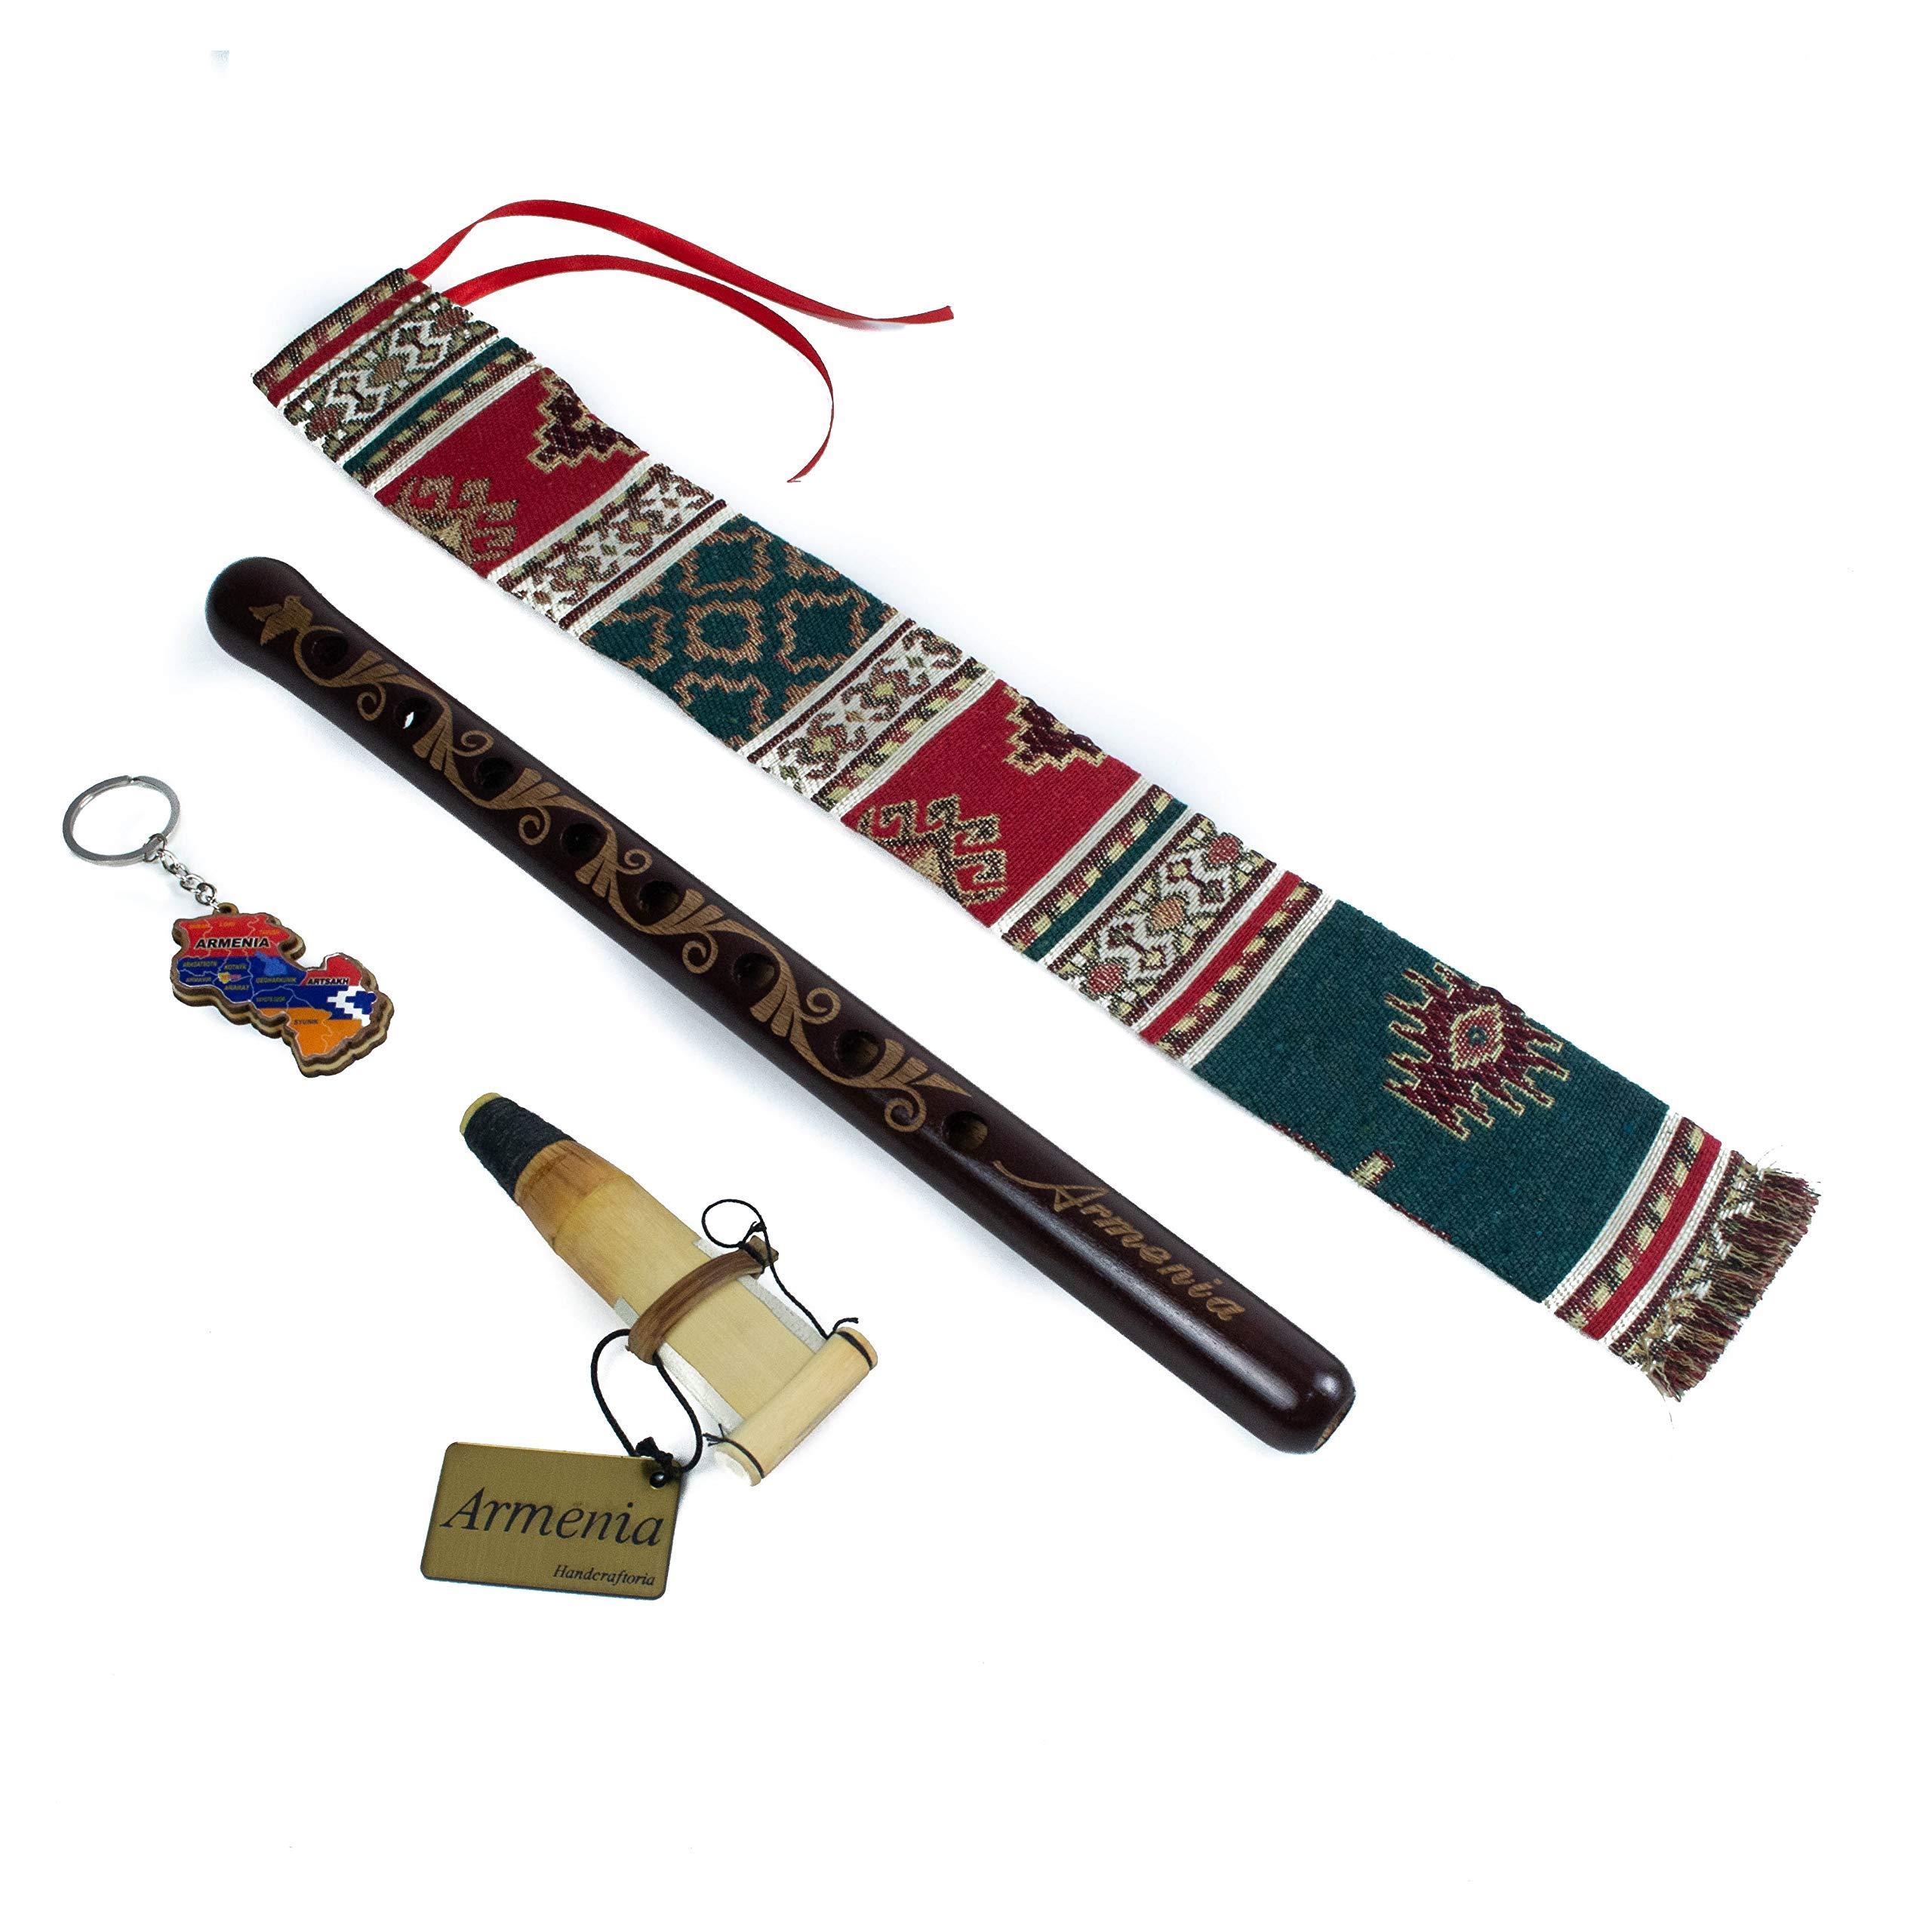 Armenian DUDUK Handmade From ARMENIA - Apricot Wood Semi-Professional Woodwind Instrument - Oboe Balaban - Gift Playing Instruction and national case